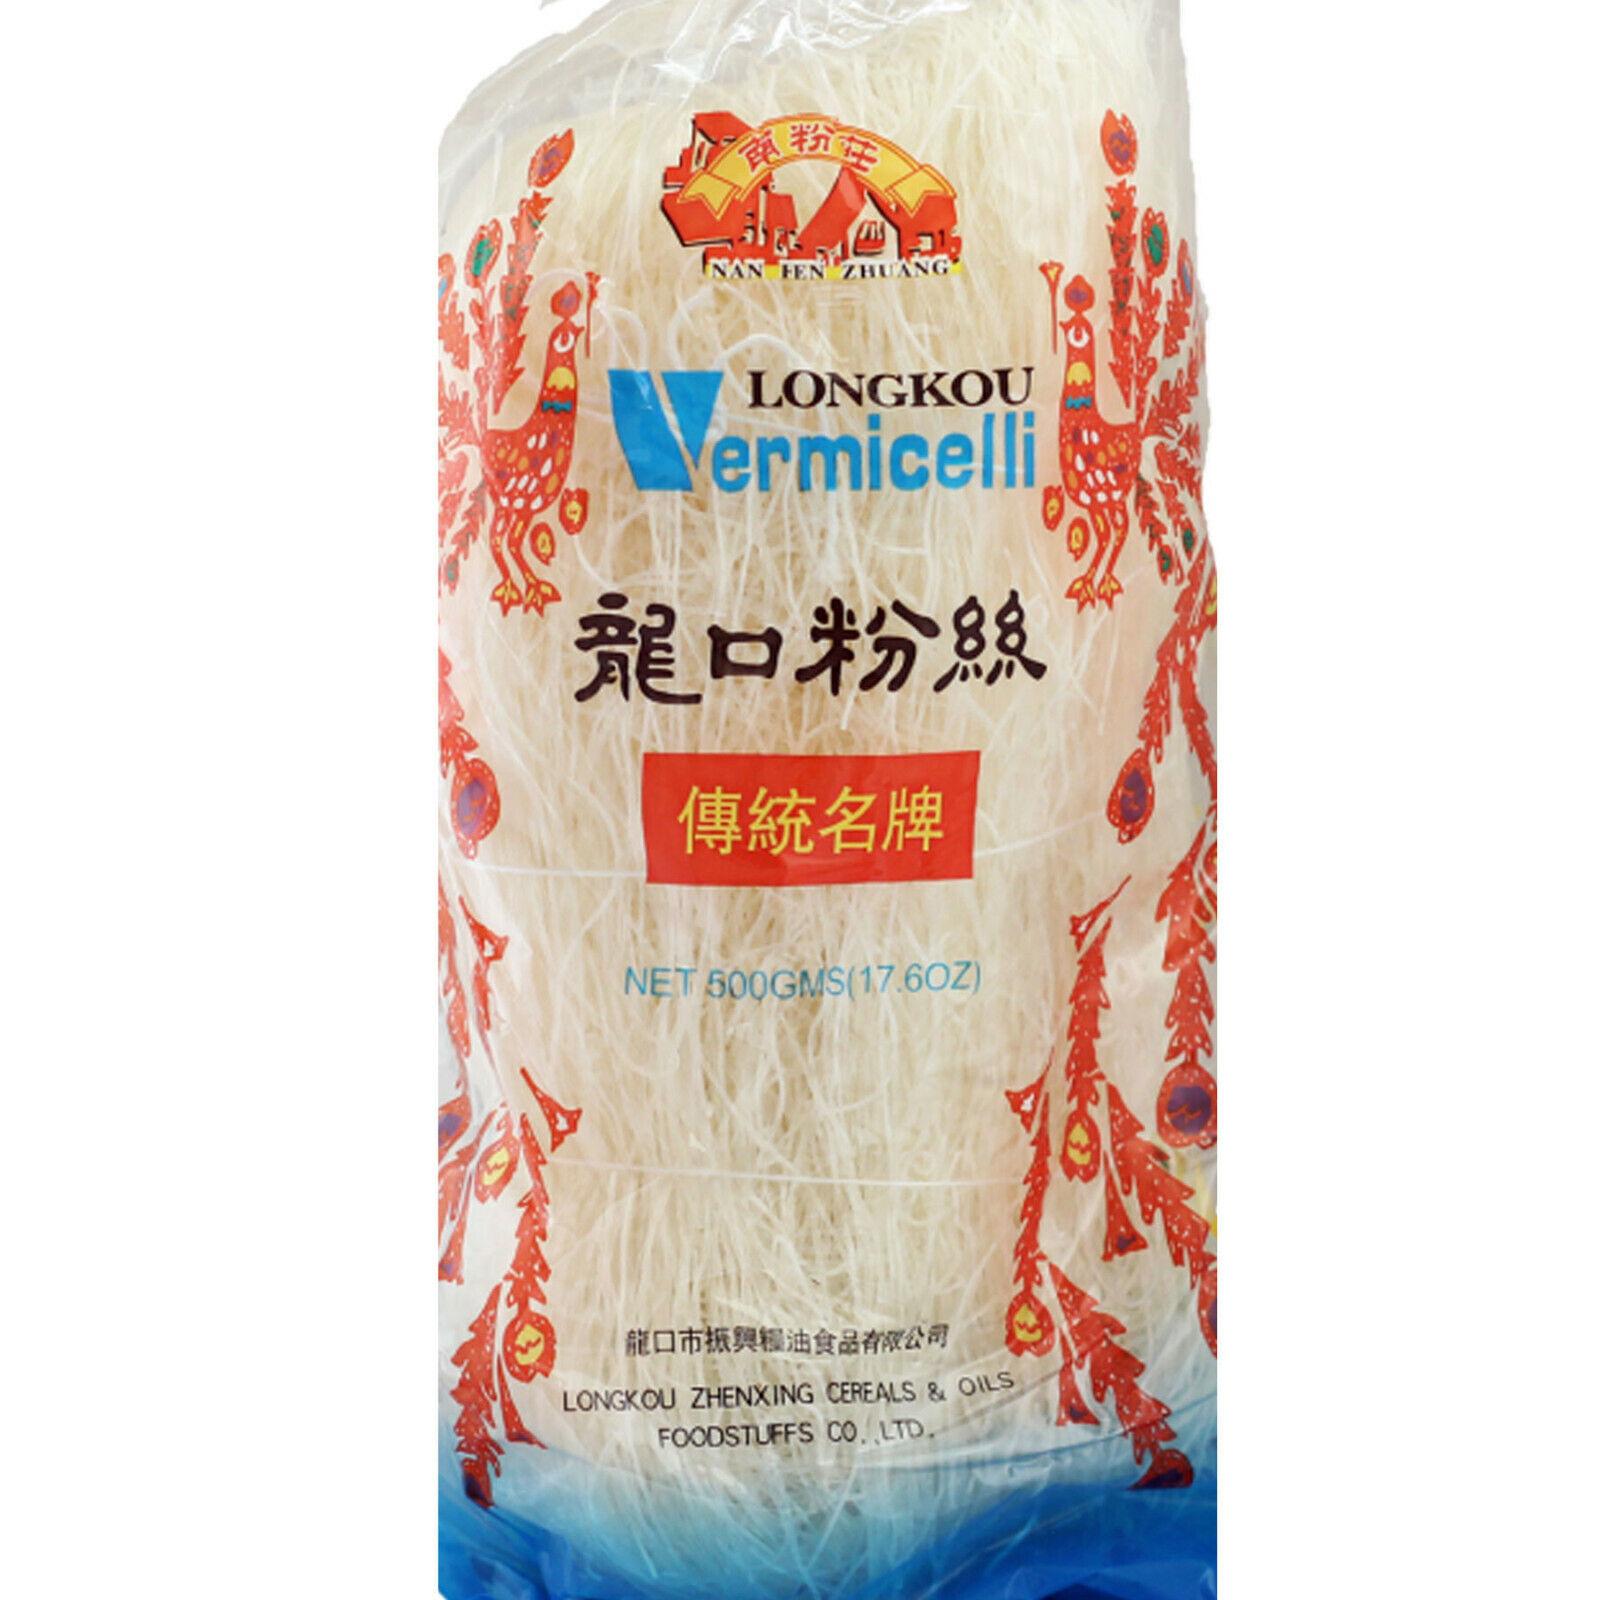 500g Glasnudeln Mungbohnen Vermicelli Longkou Diamond Brand Beans Thread/Sai Fun